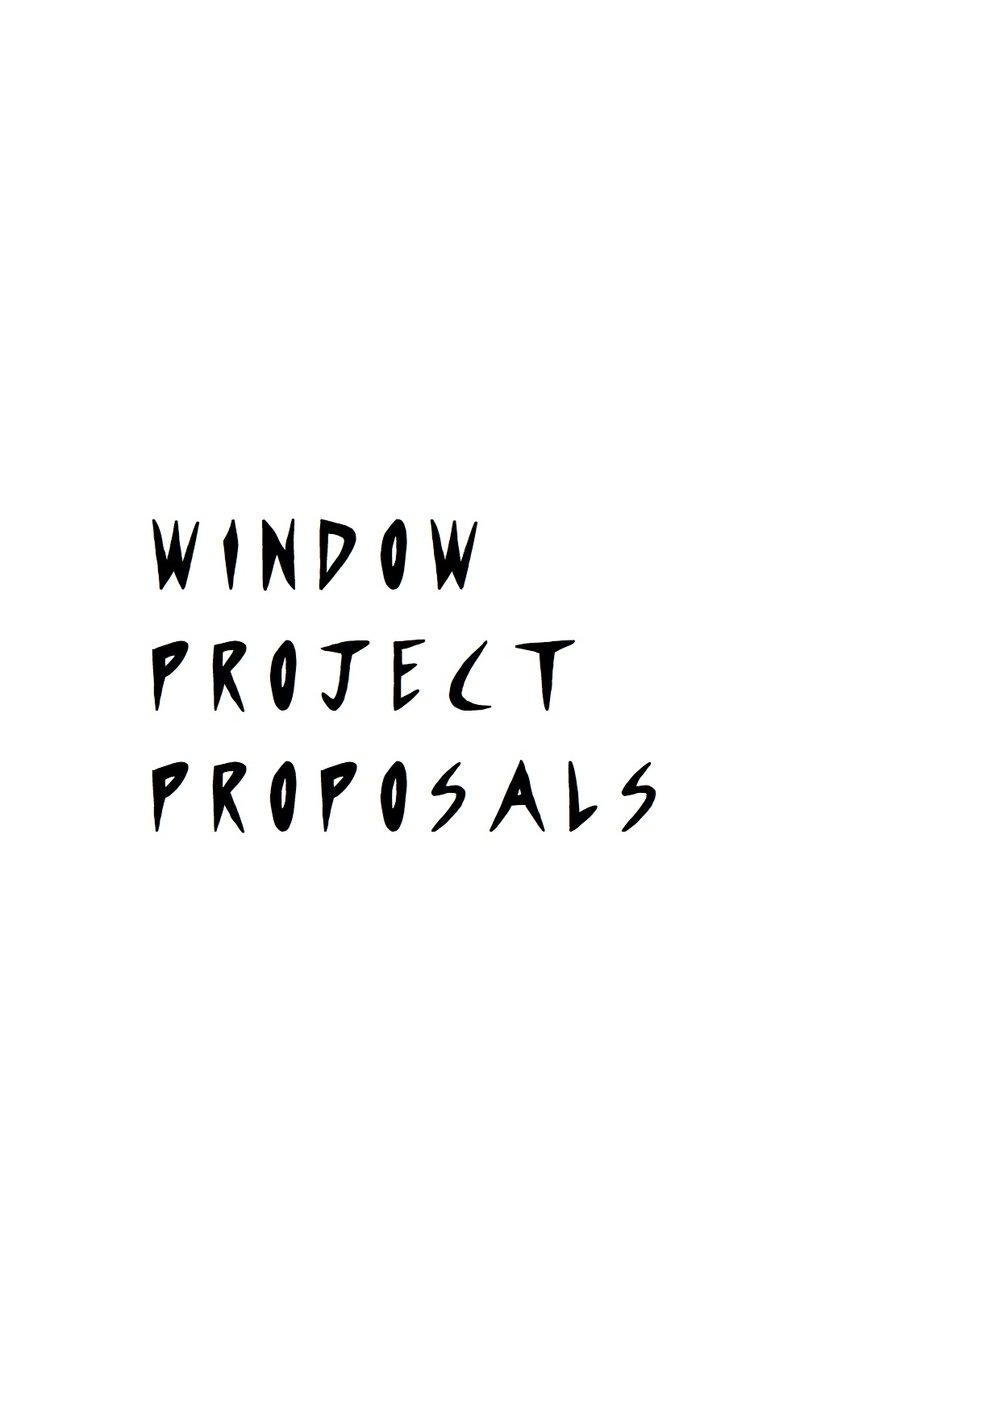 WINDOW-copy.jpg